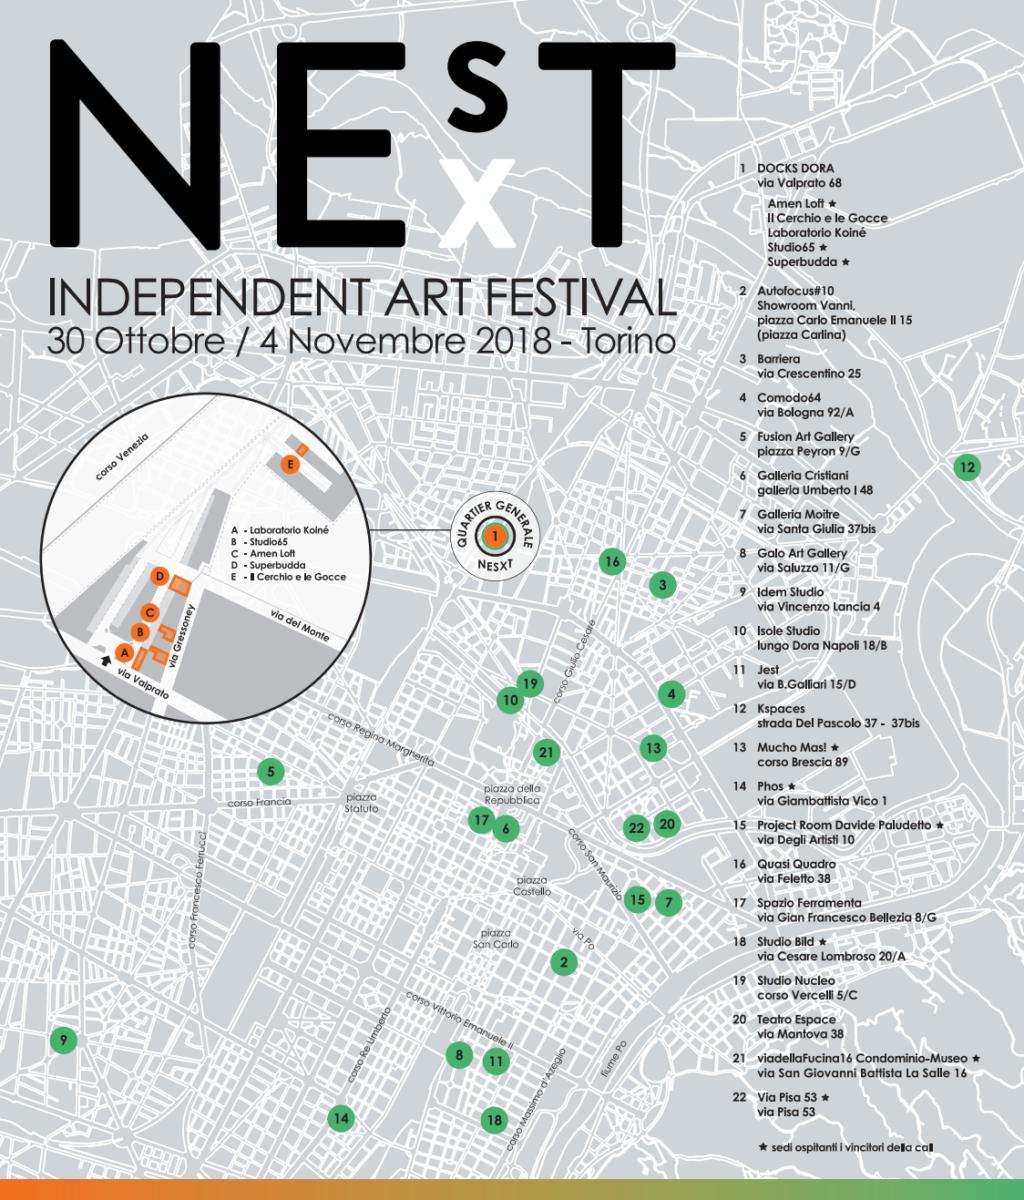 NESXT Festival 2018 map-1024x1200